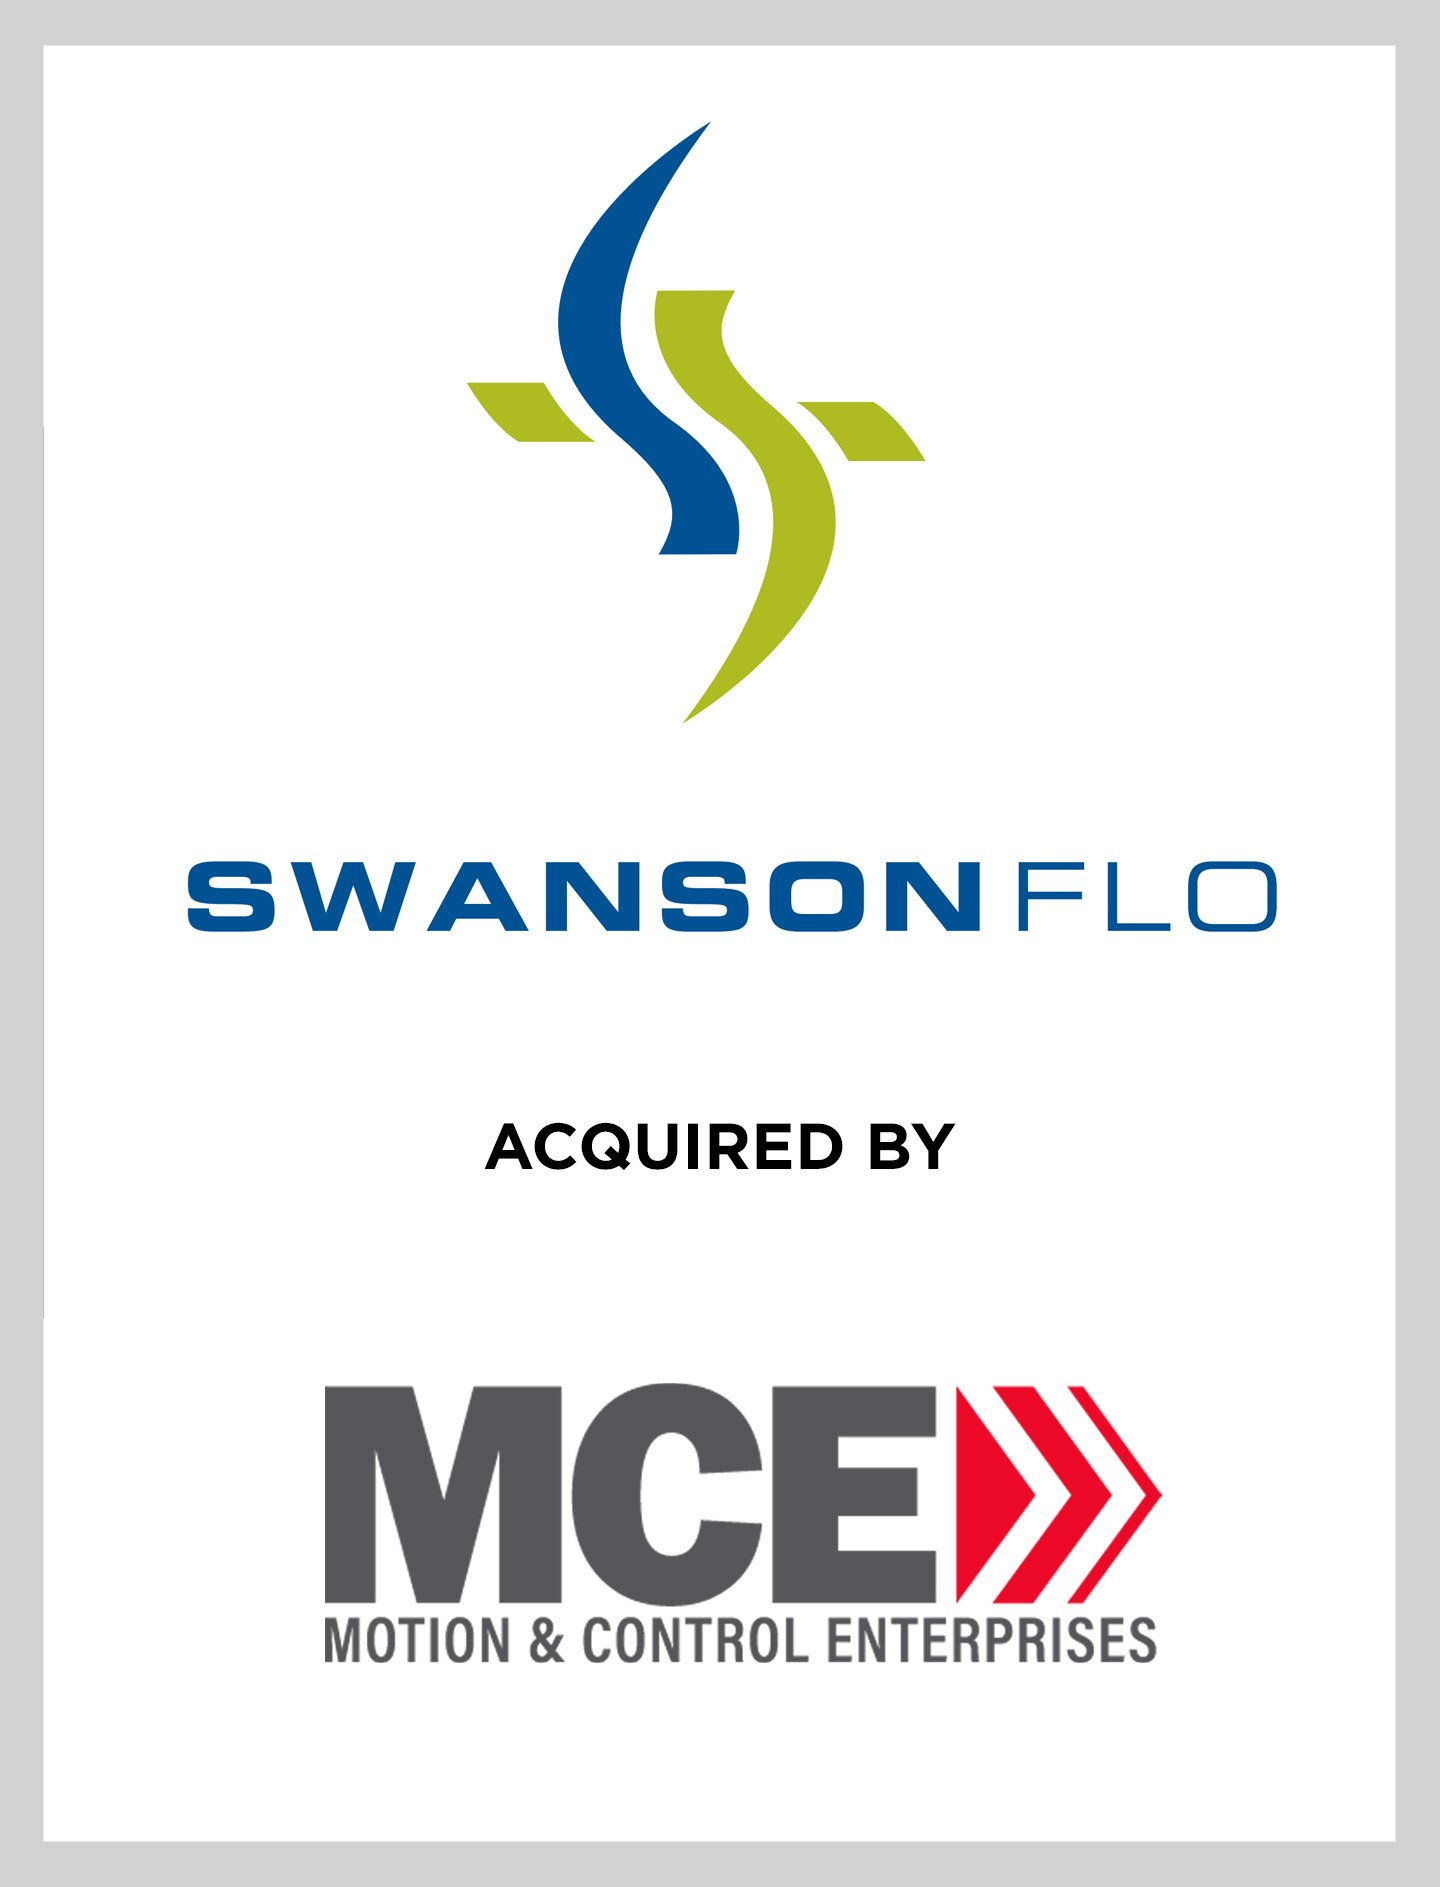 Swanson Flo_MCE